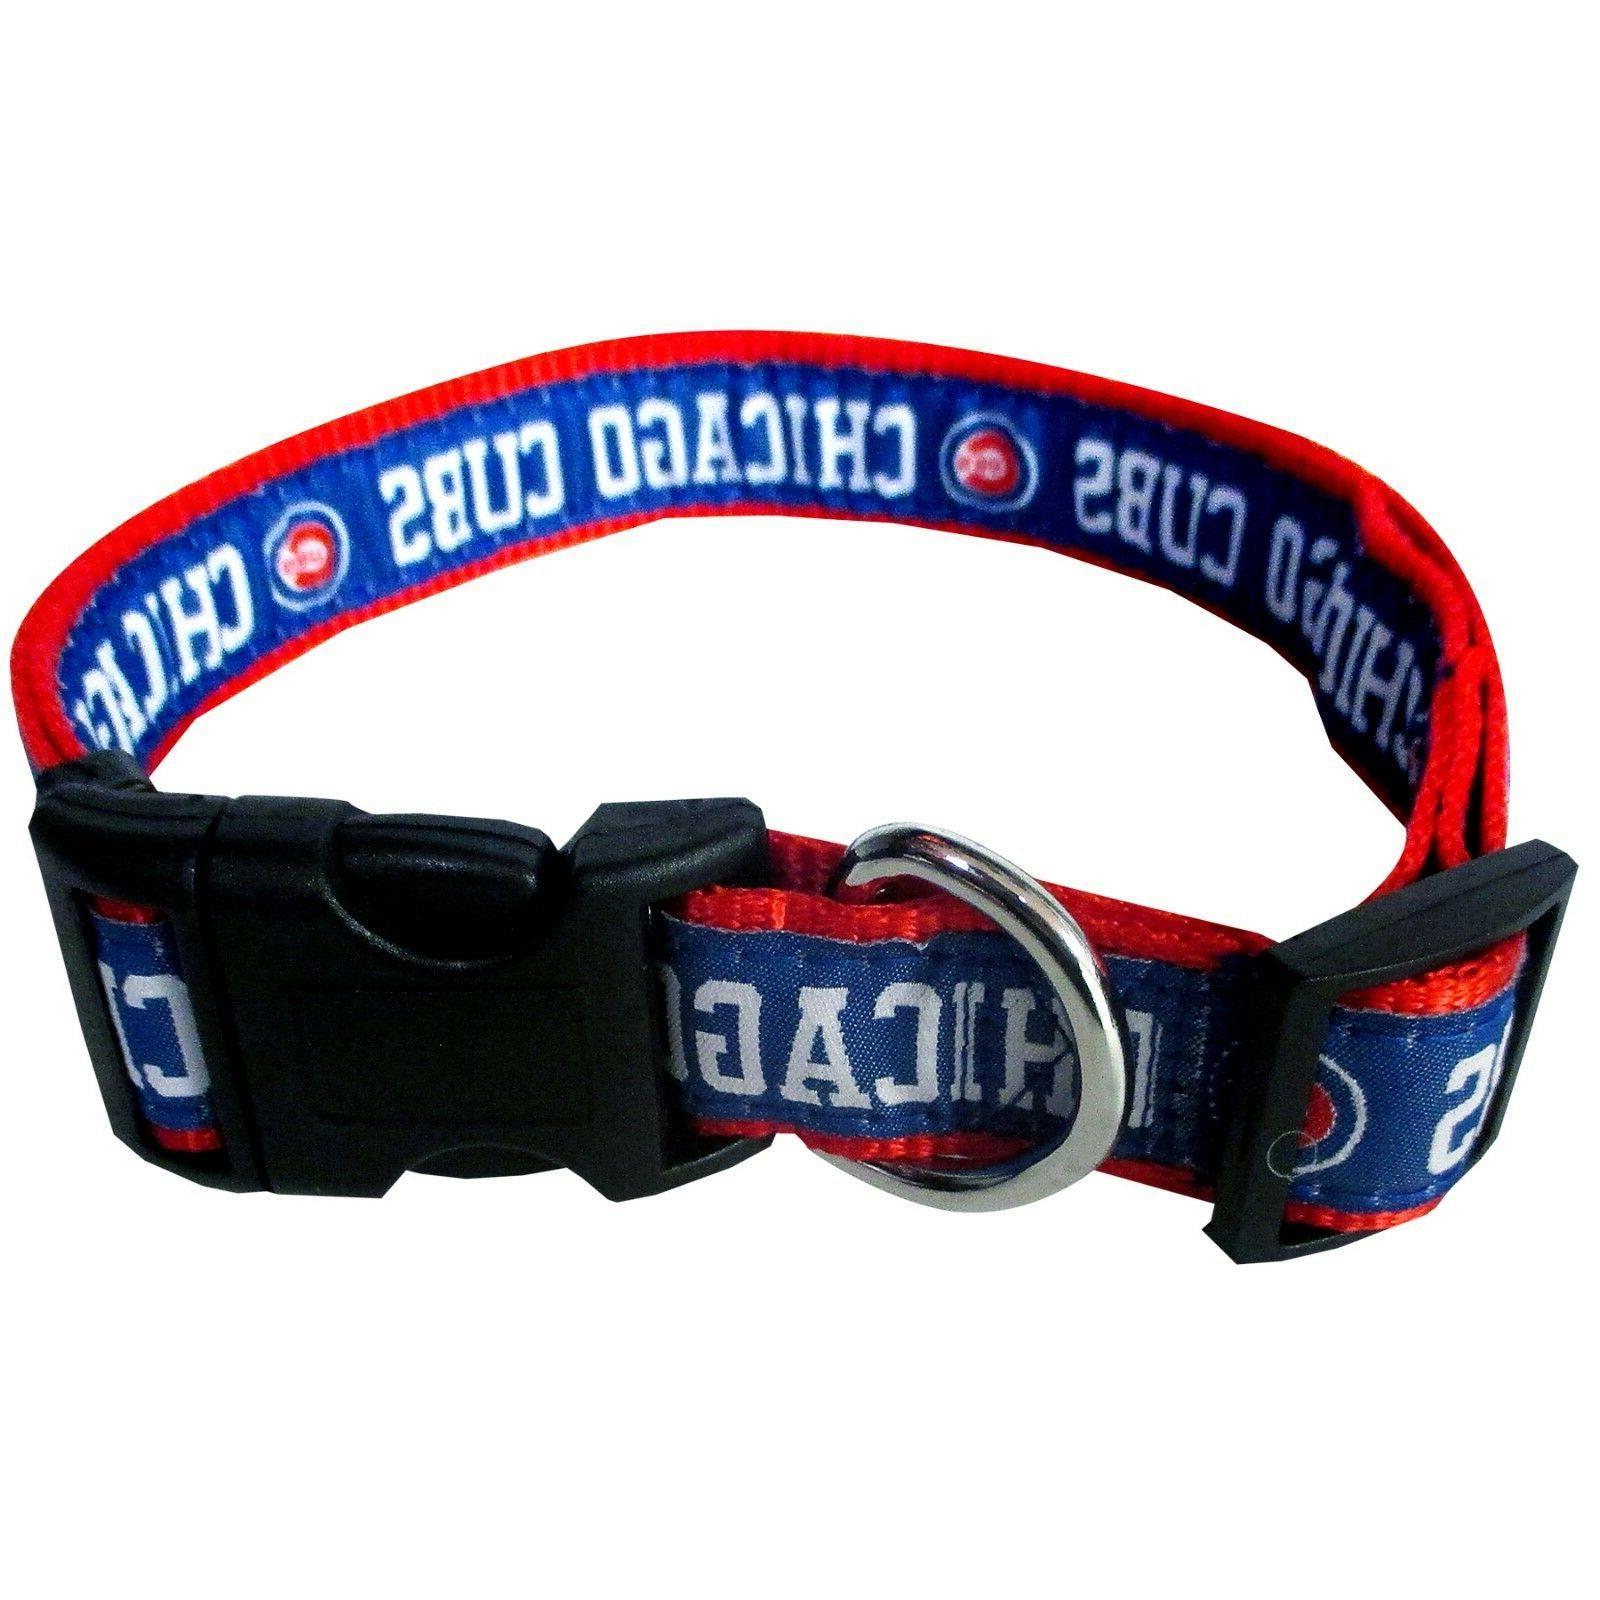 Pets Collar, Sizes, Teams Dog